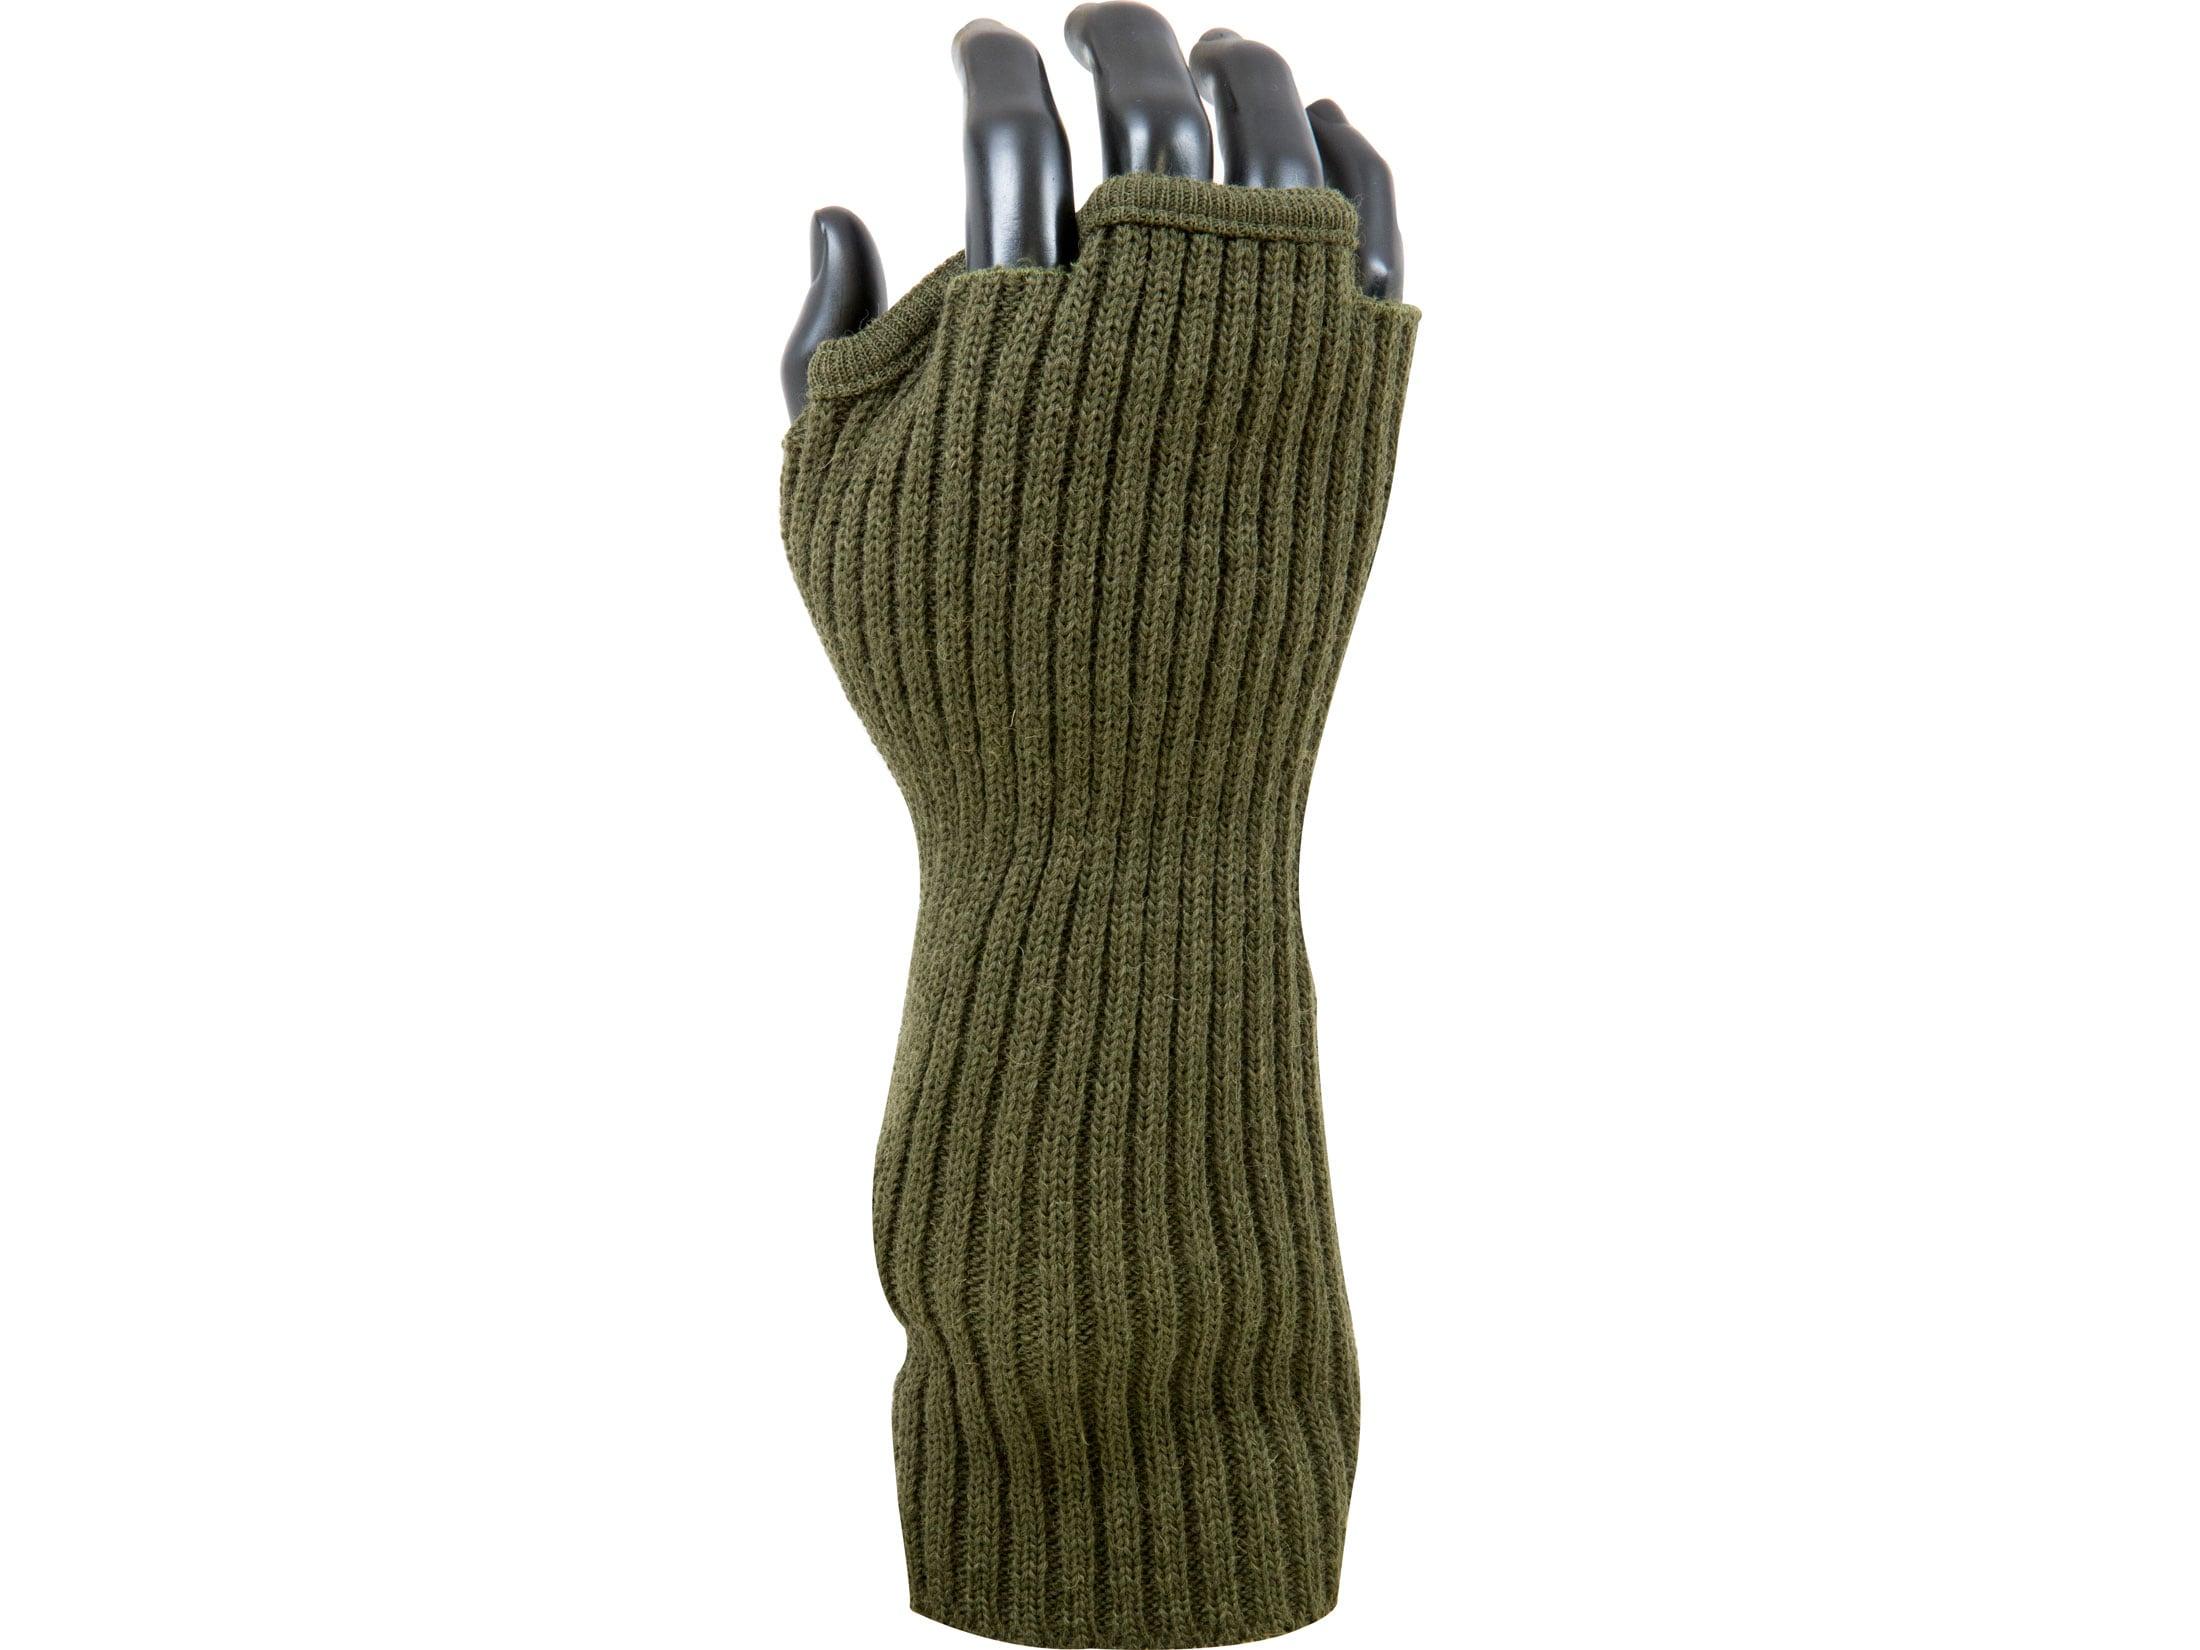 Military Fingerless Wool Gloves USA Made